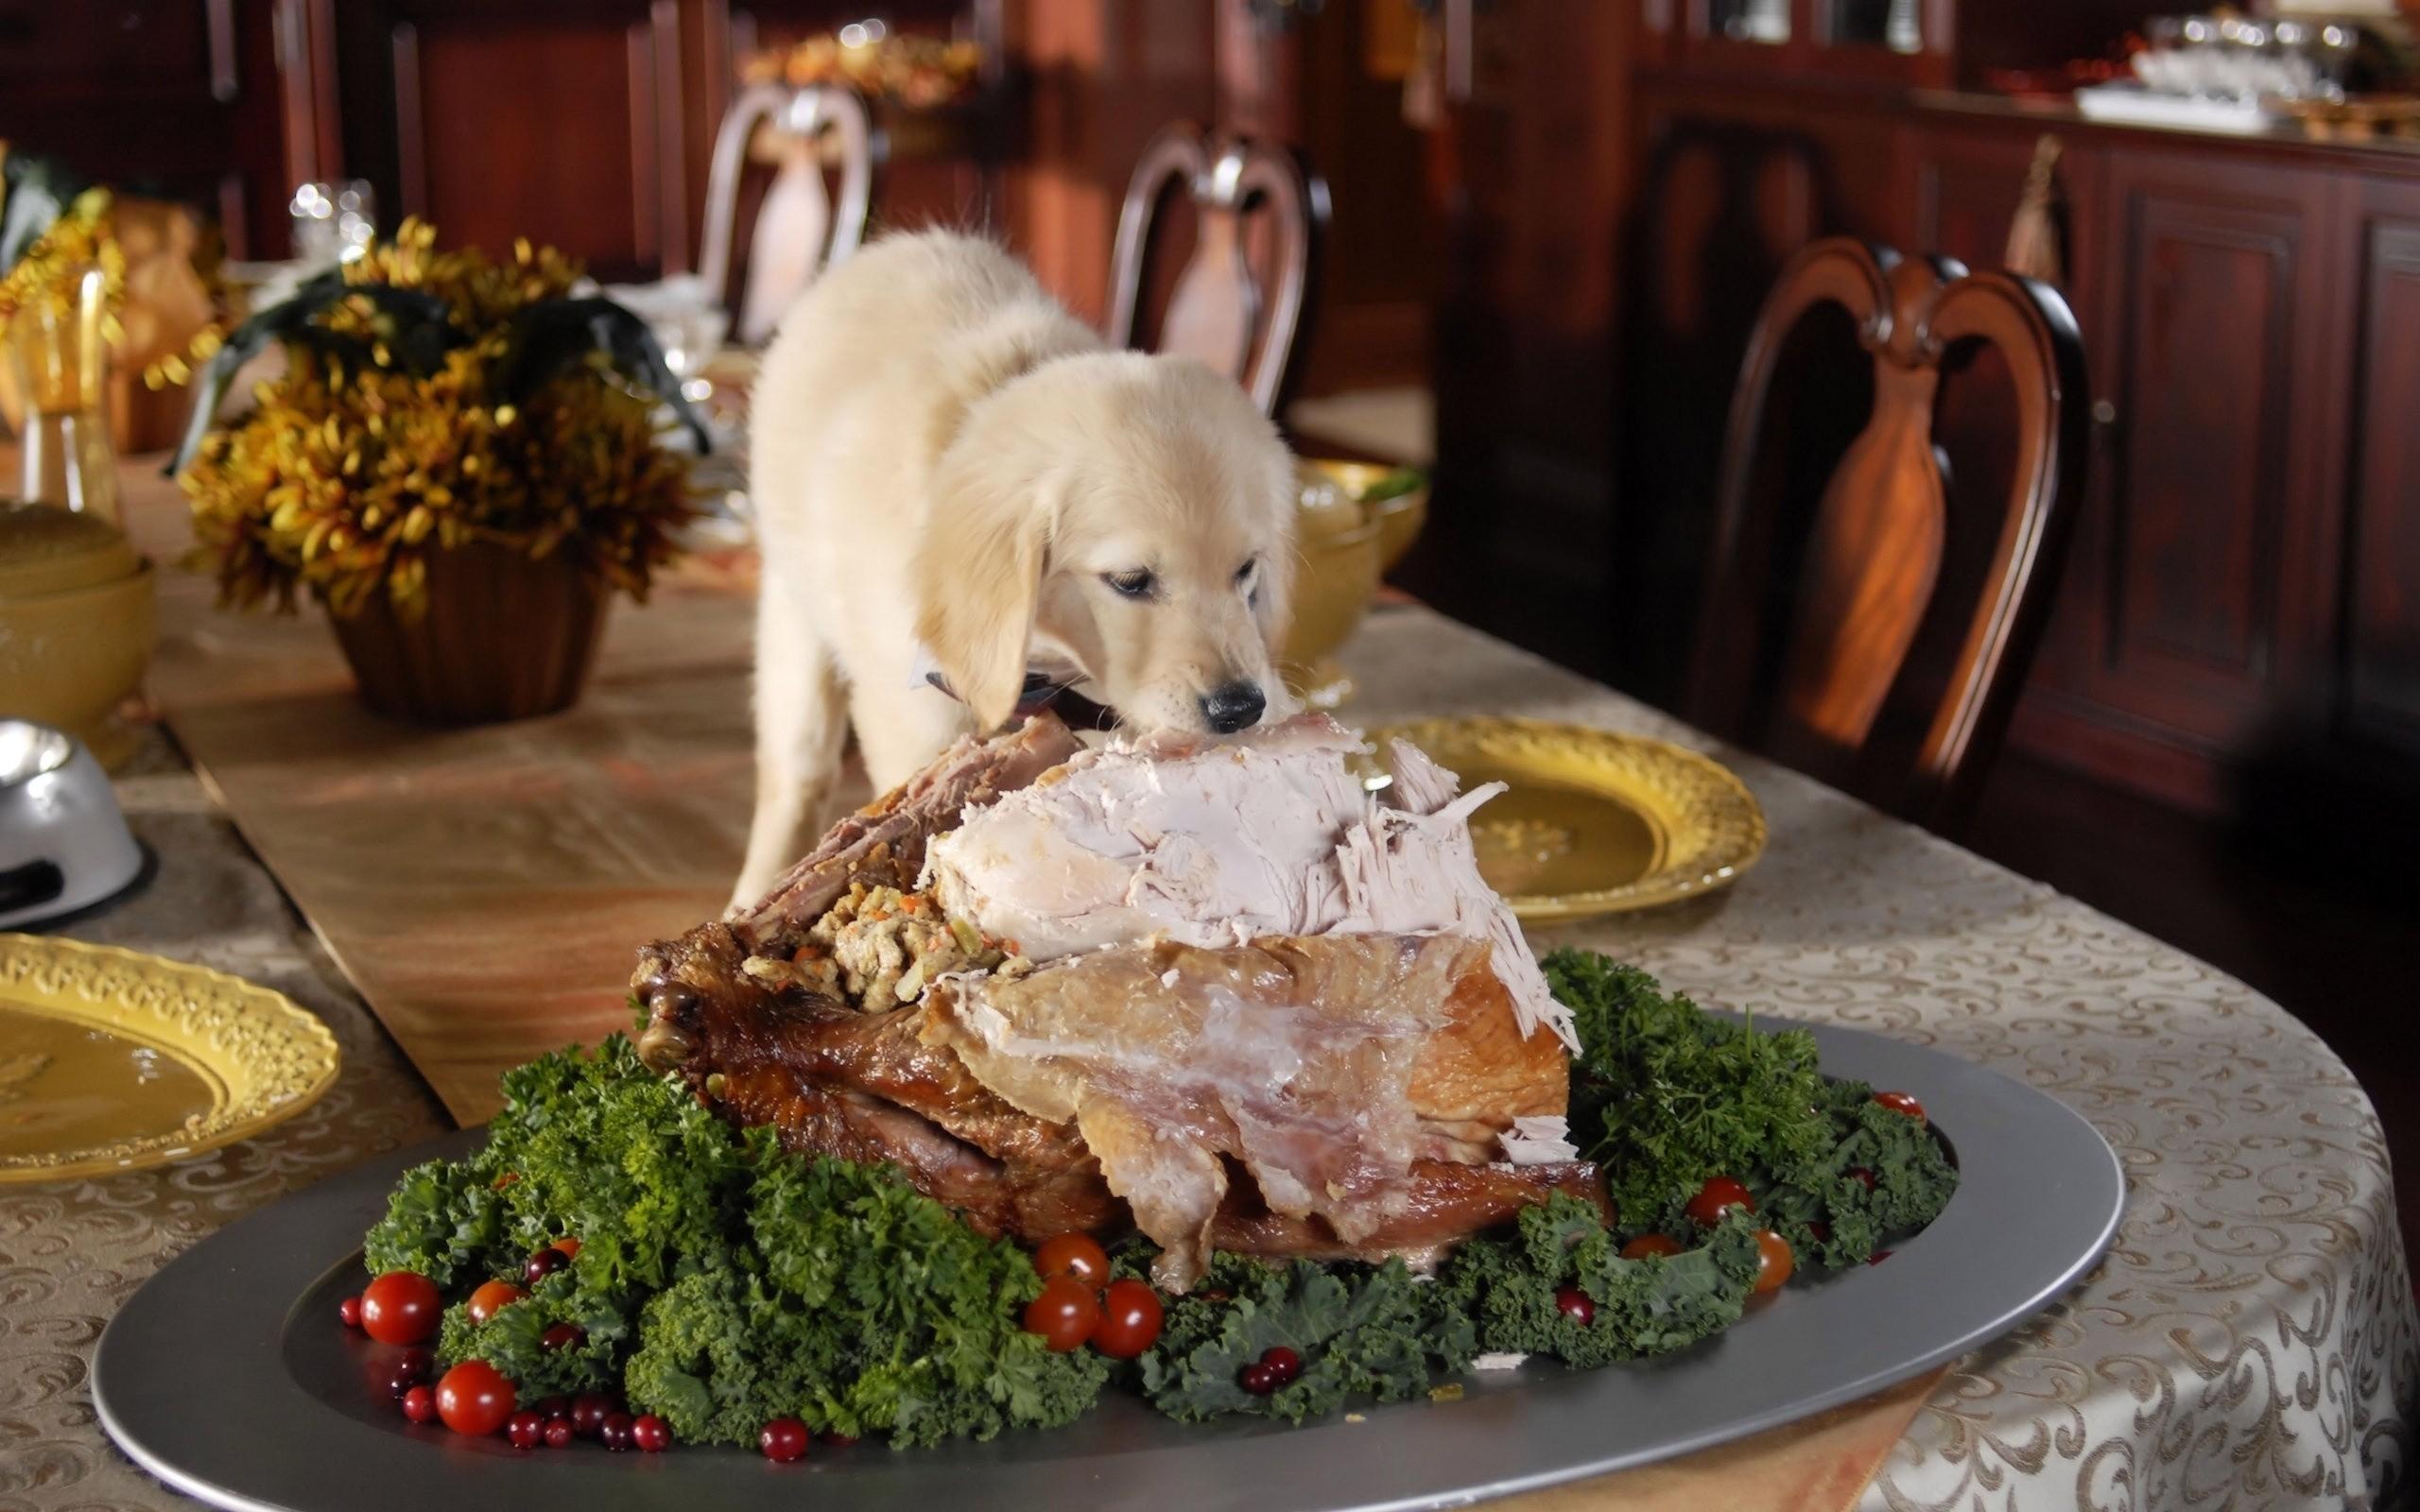 Even puppy eats turkey in Thanksgiving wallpaper